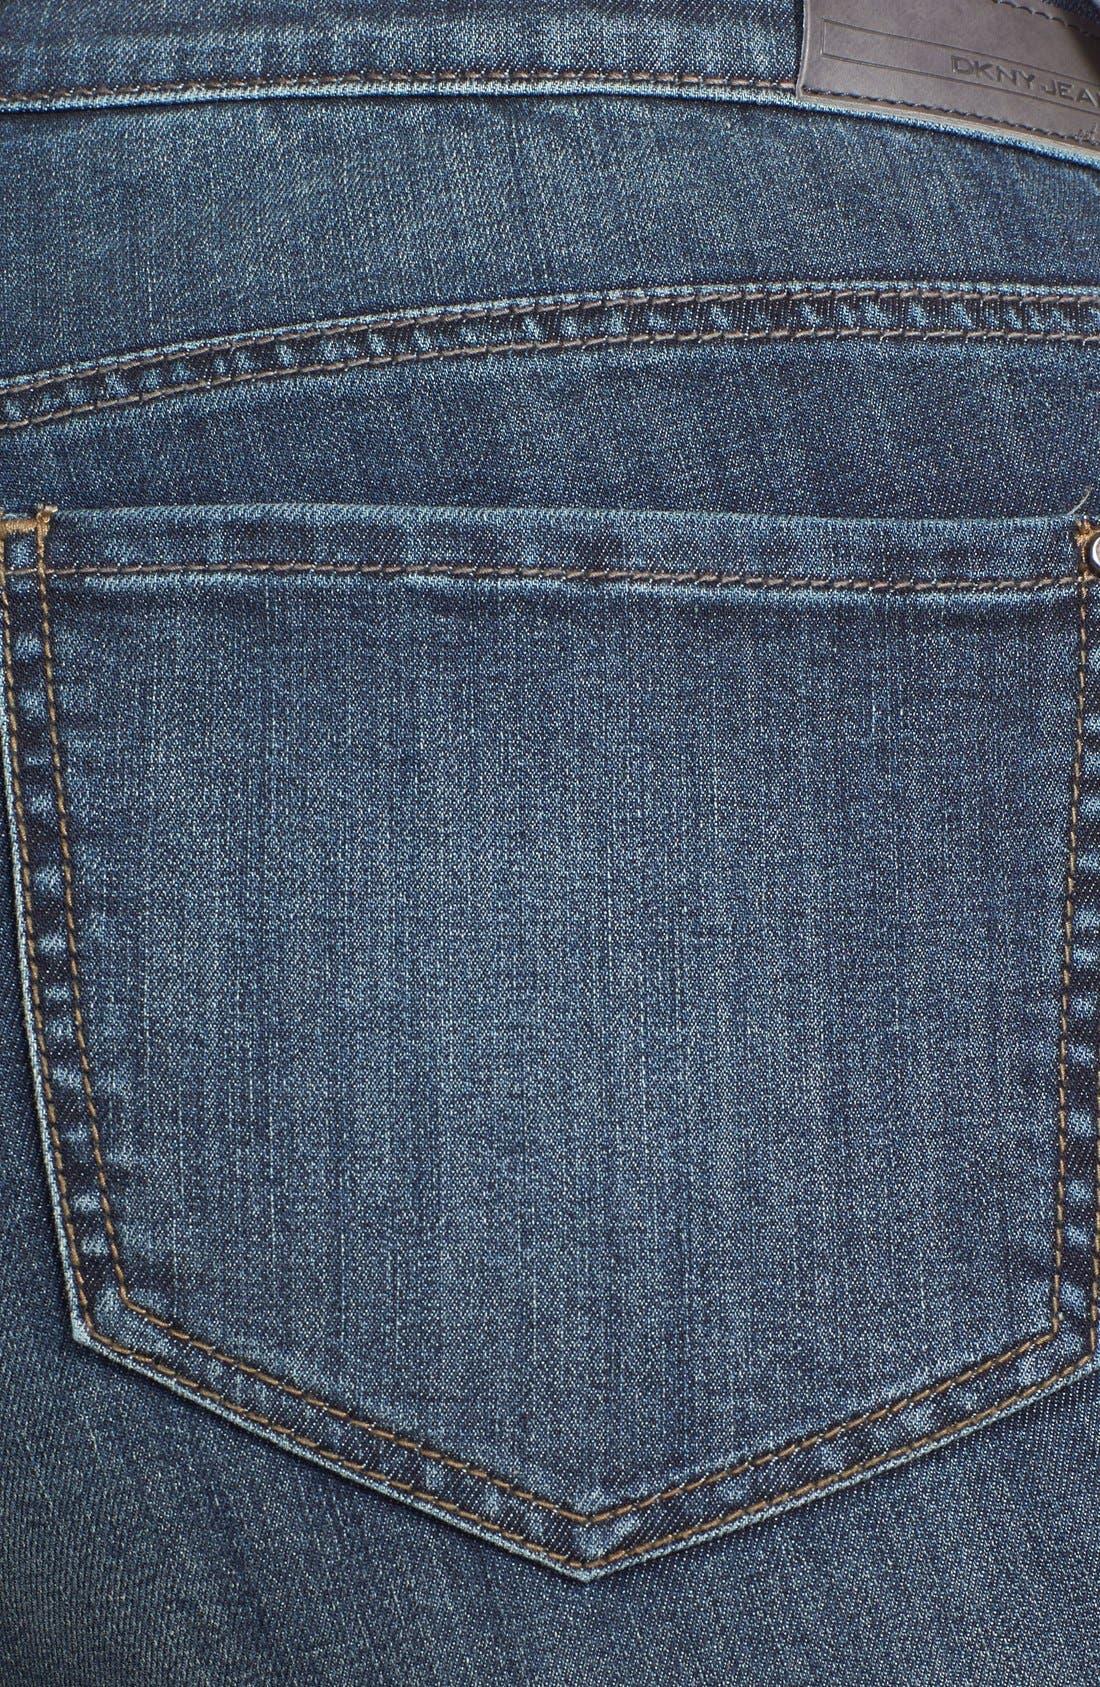 'Soho' Stretch Skinny Jeans,                             Alternate thumbnail 3, color,                             462